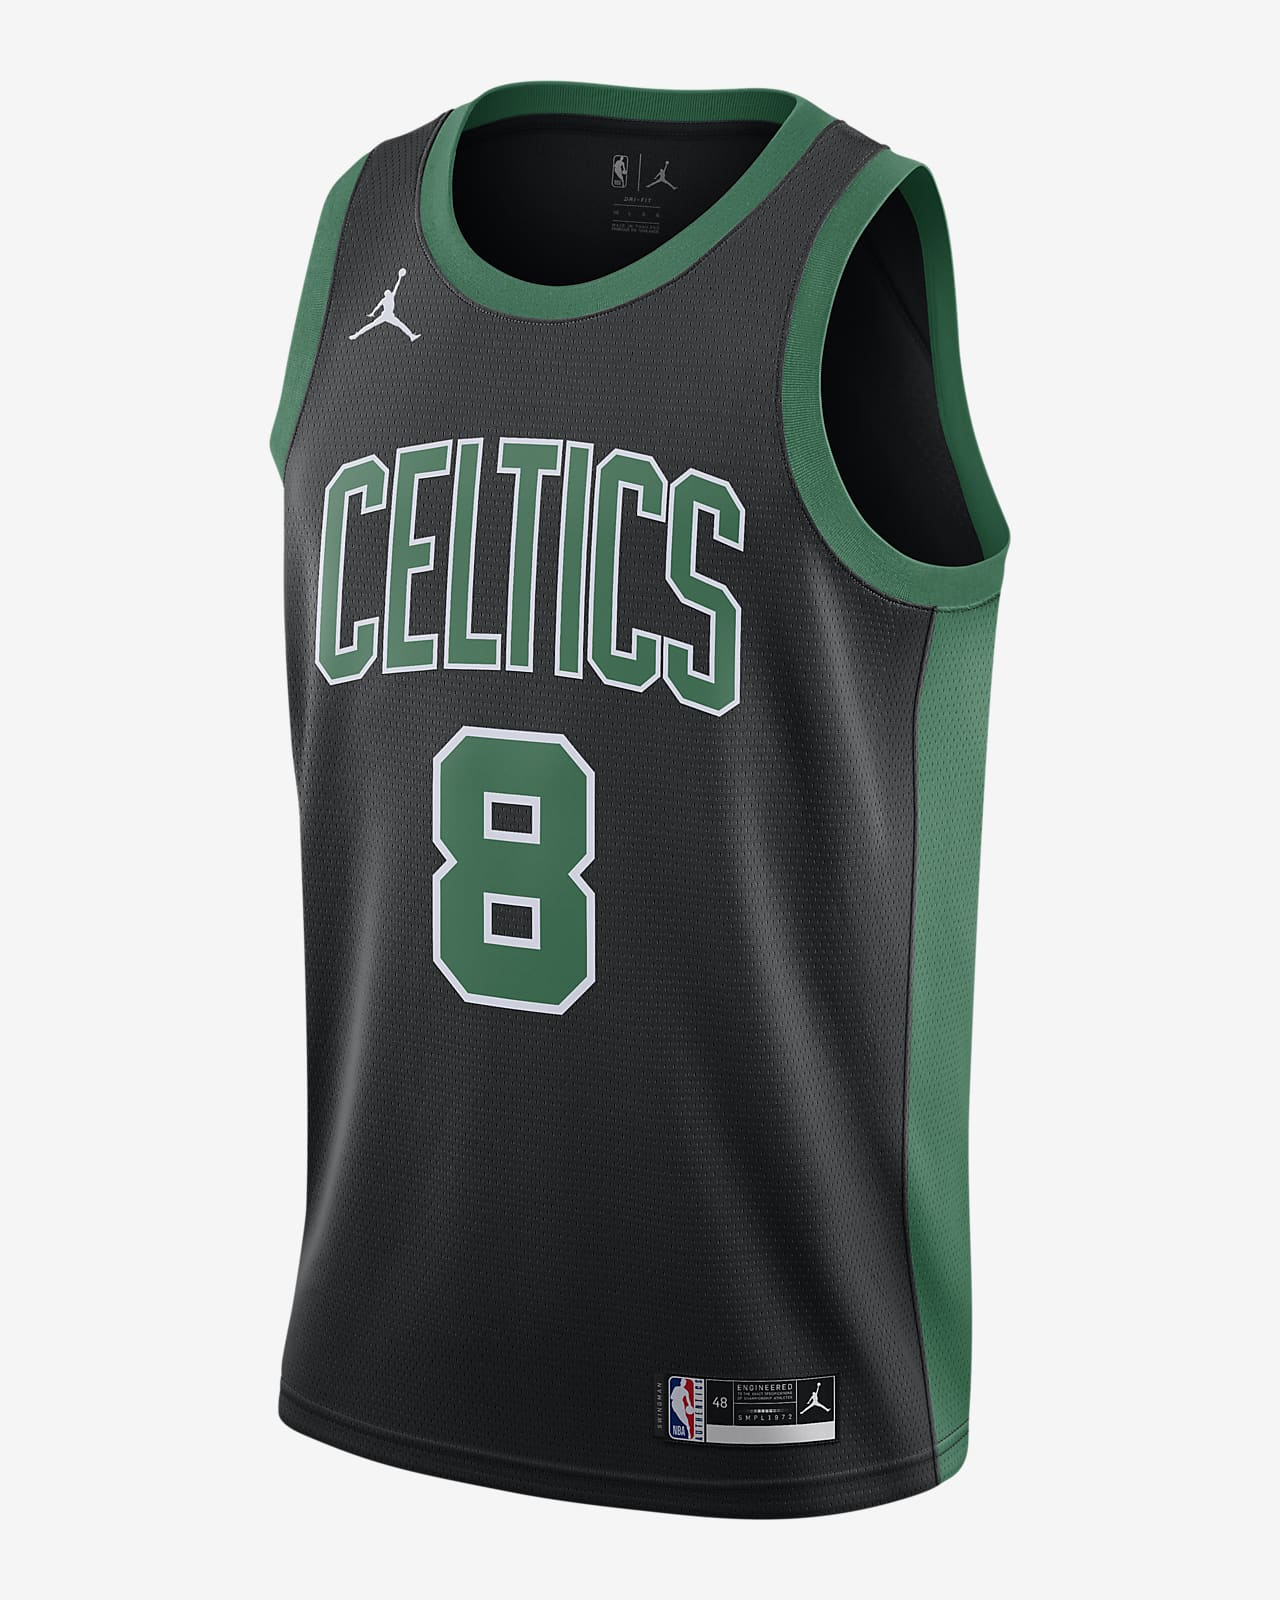 Maillot Jordan NBA Swingman Kemba Walker Celtics Statement Edition 2020